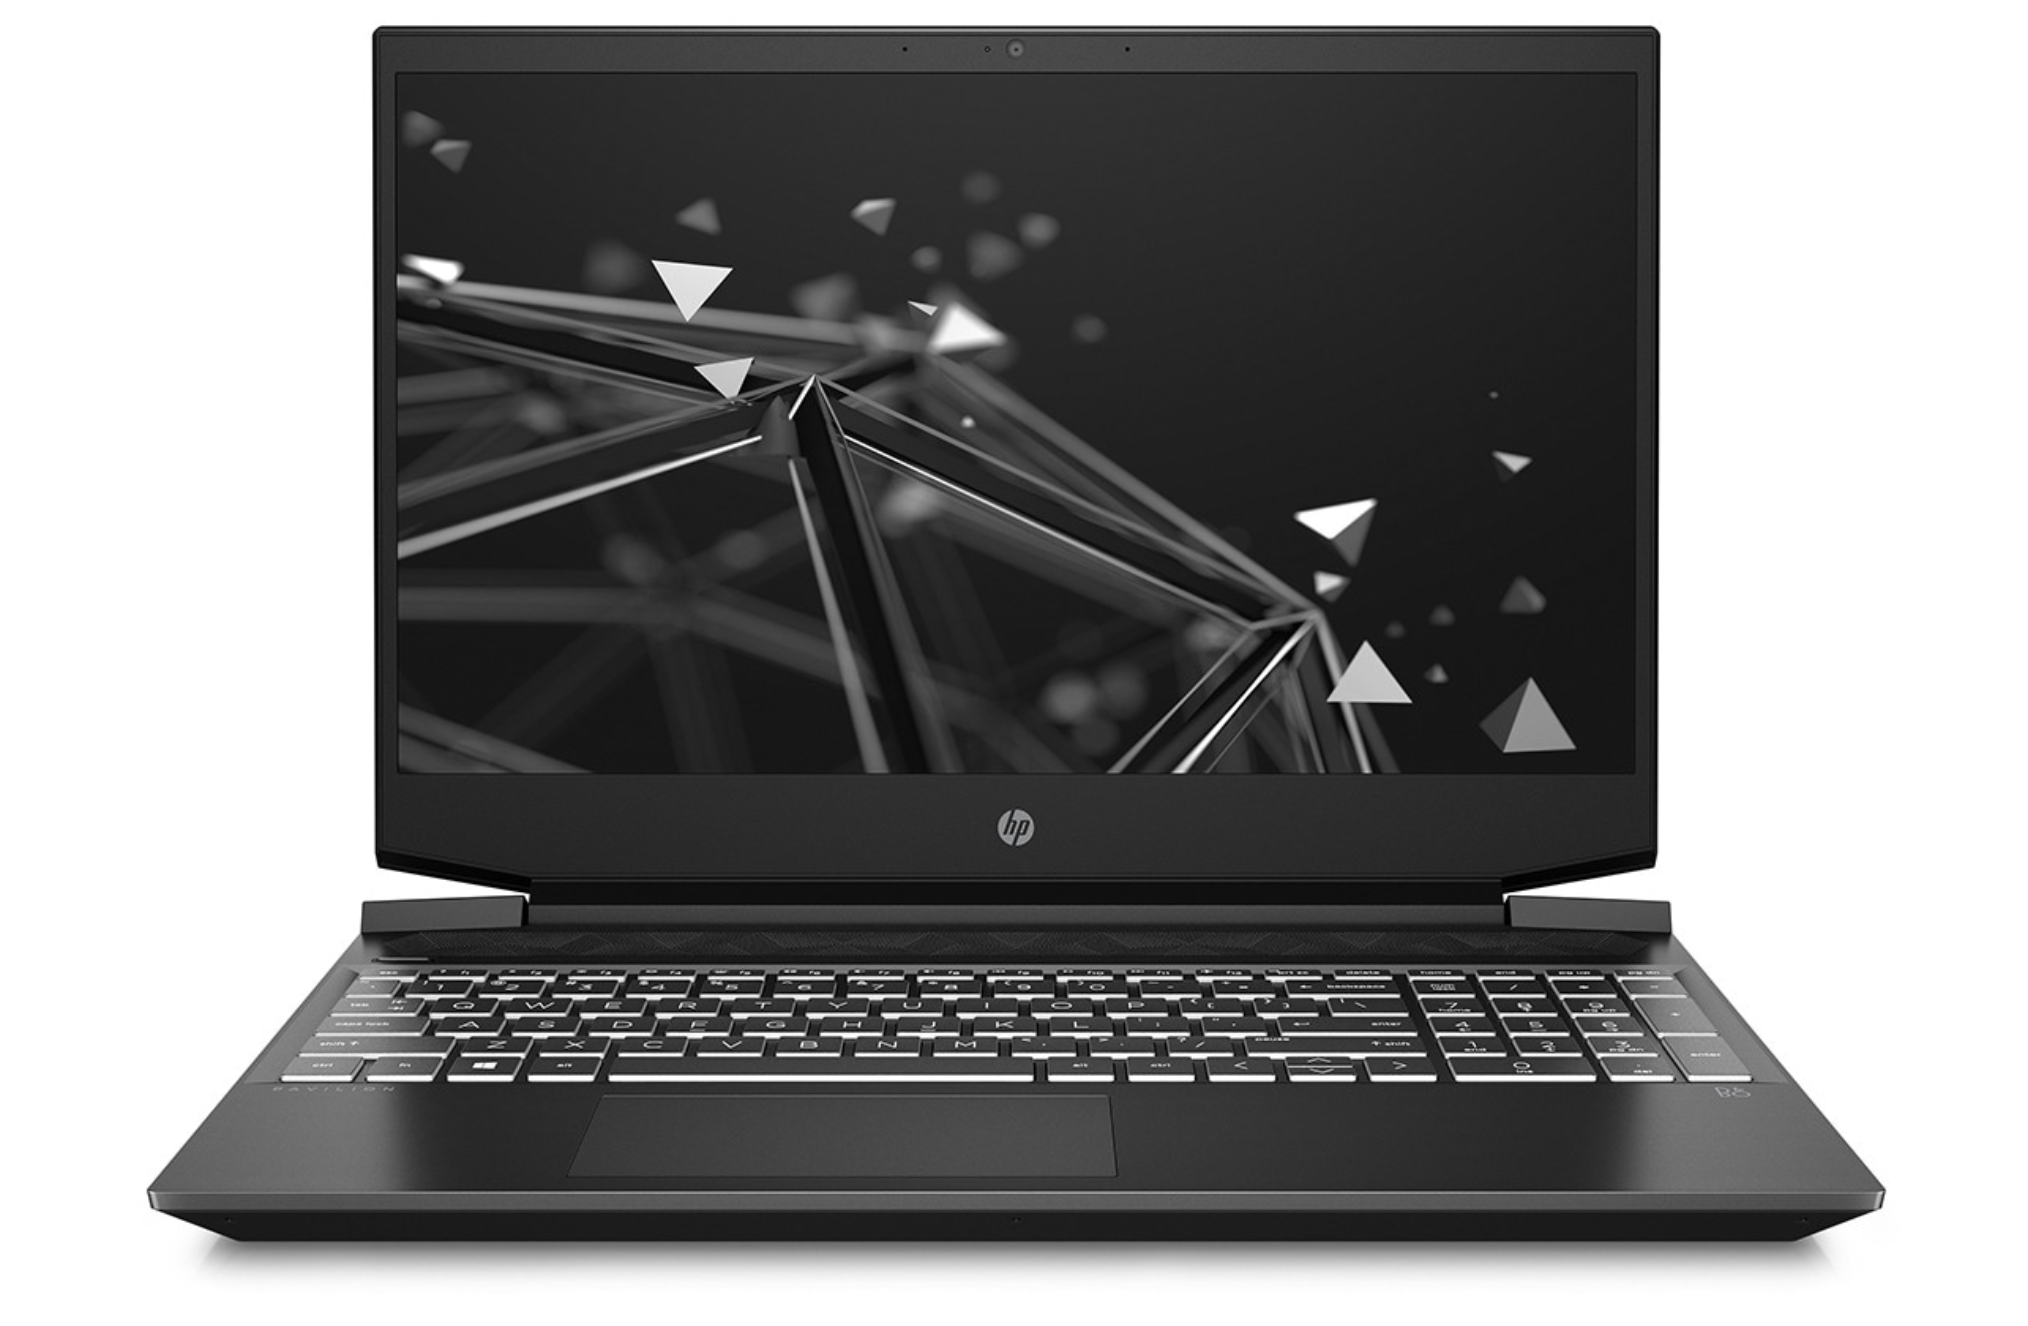 HP Pavilion Gaming 15-ec2008ns, AMD Ryzen 5, 8GB, 256GB SSD, GeForce GTX 1650 4GB, FreeDOS / Sin Sistema Operativo